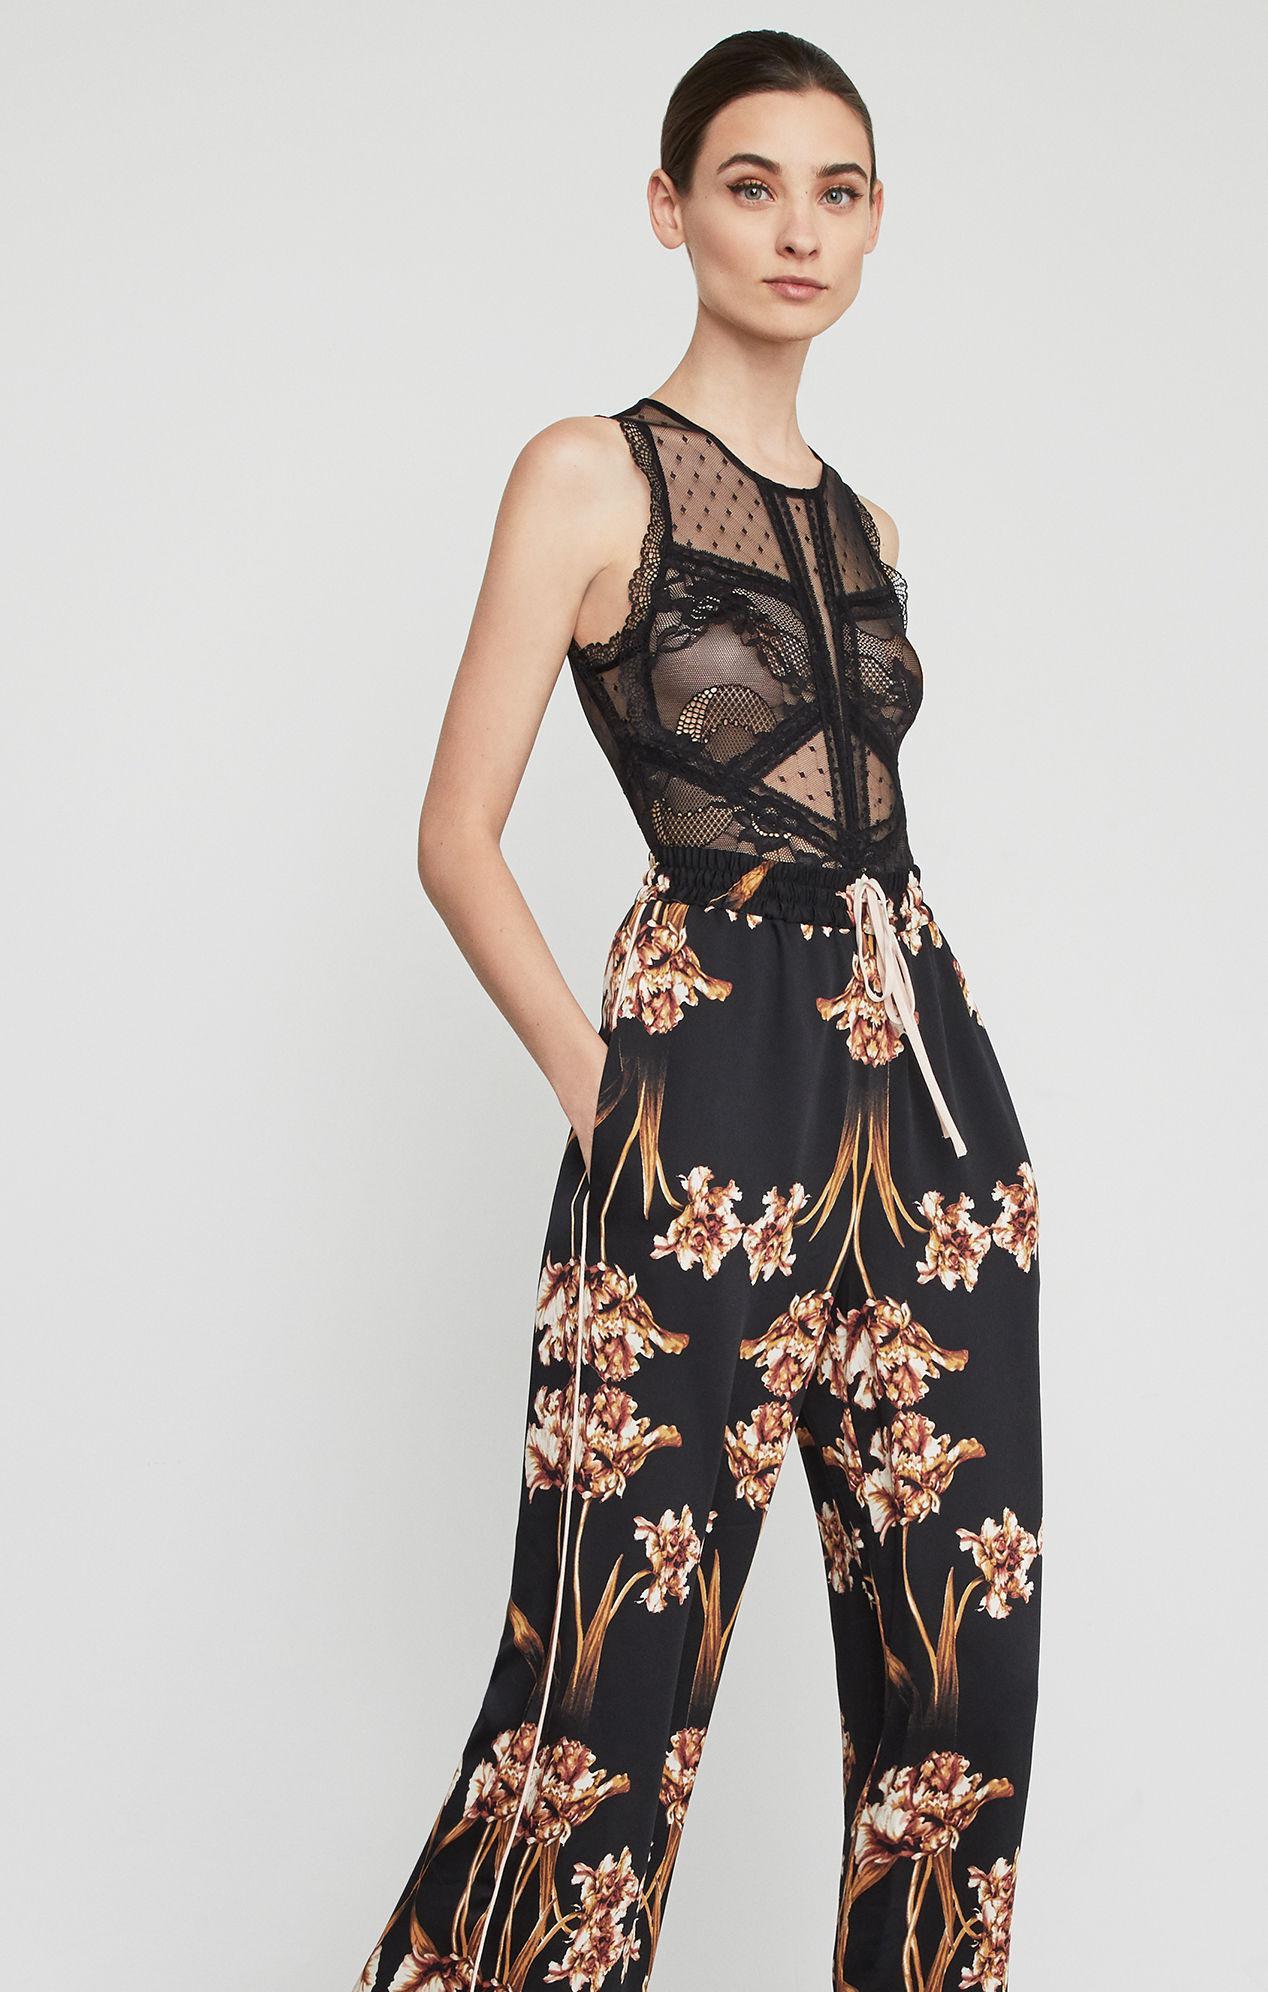 ac8e37962218 Lyst - BCBGMAXAZRIA Bcbg Sleeveless Floral Lace Bodysuit in Black